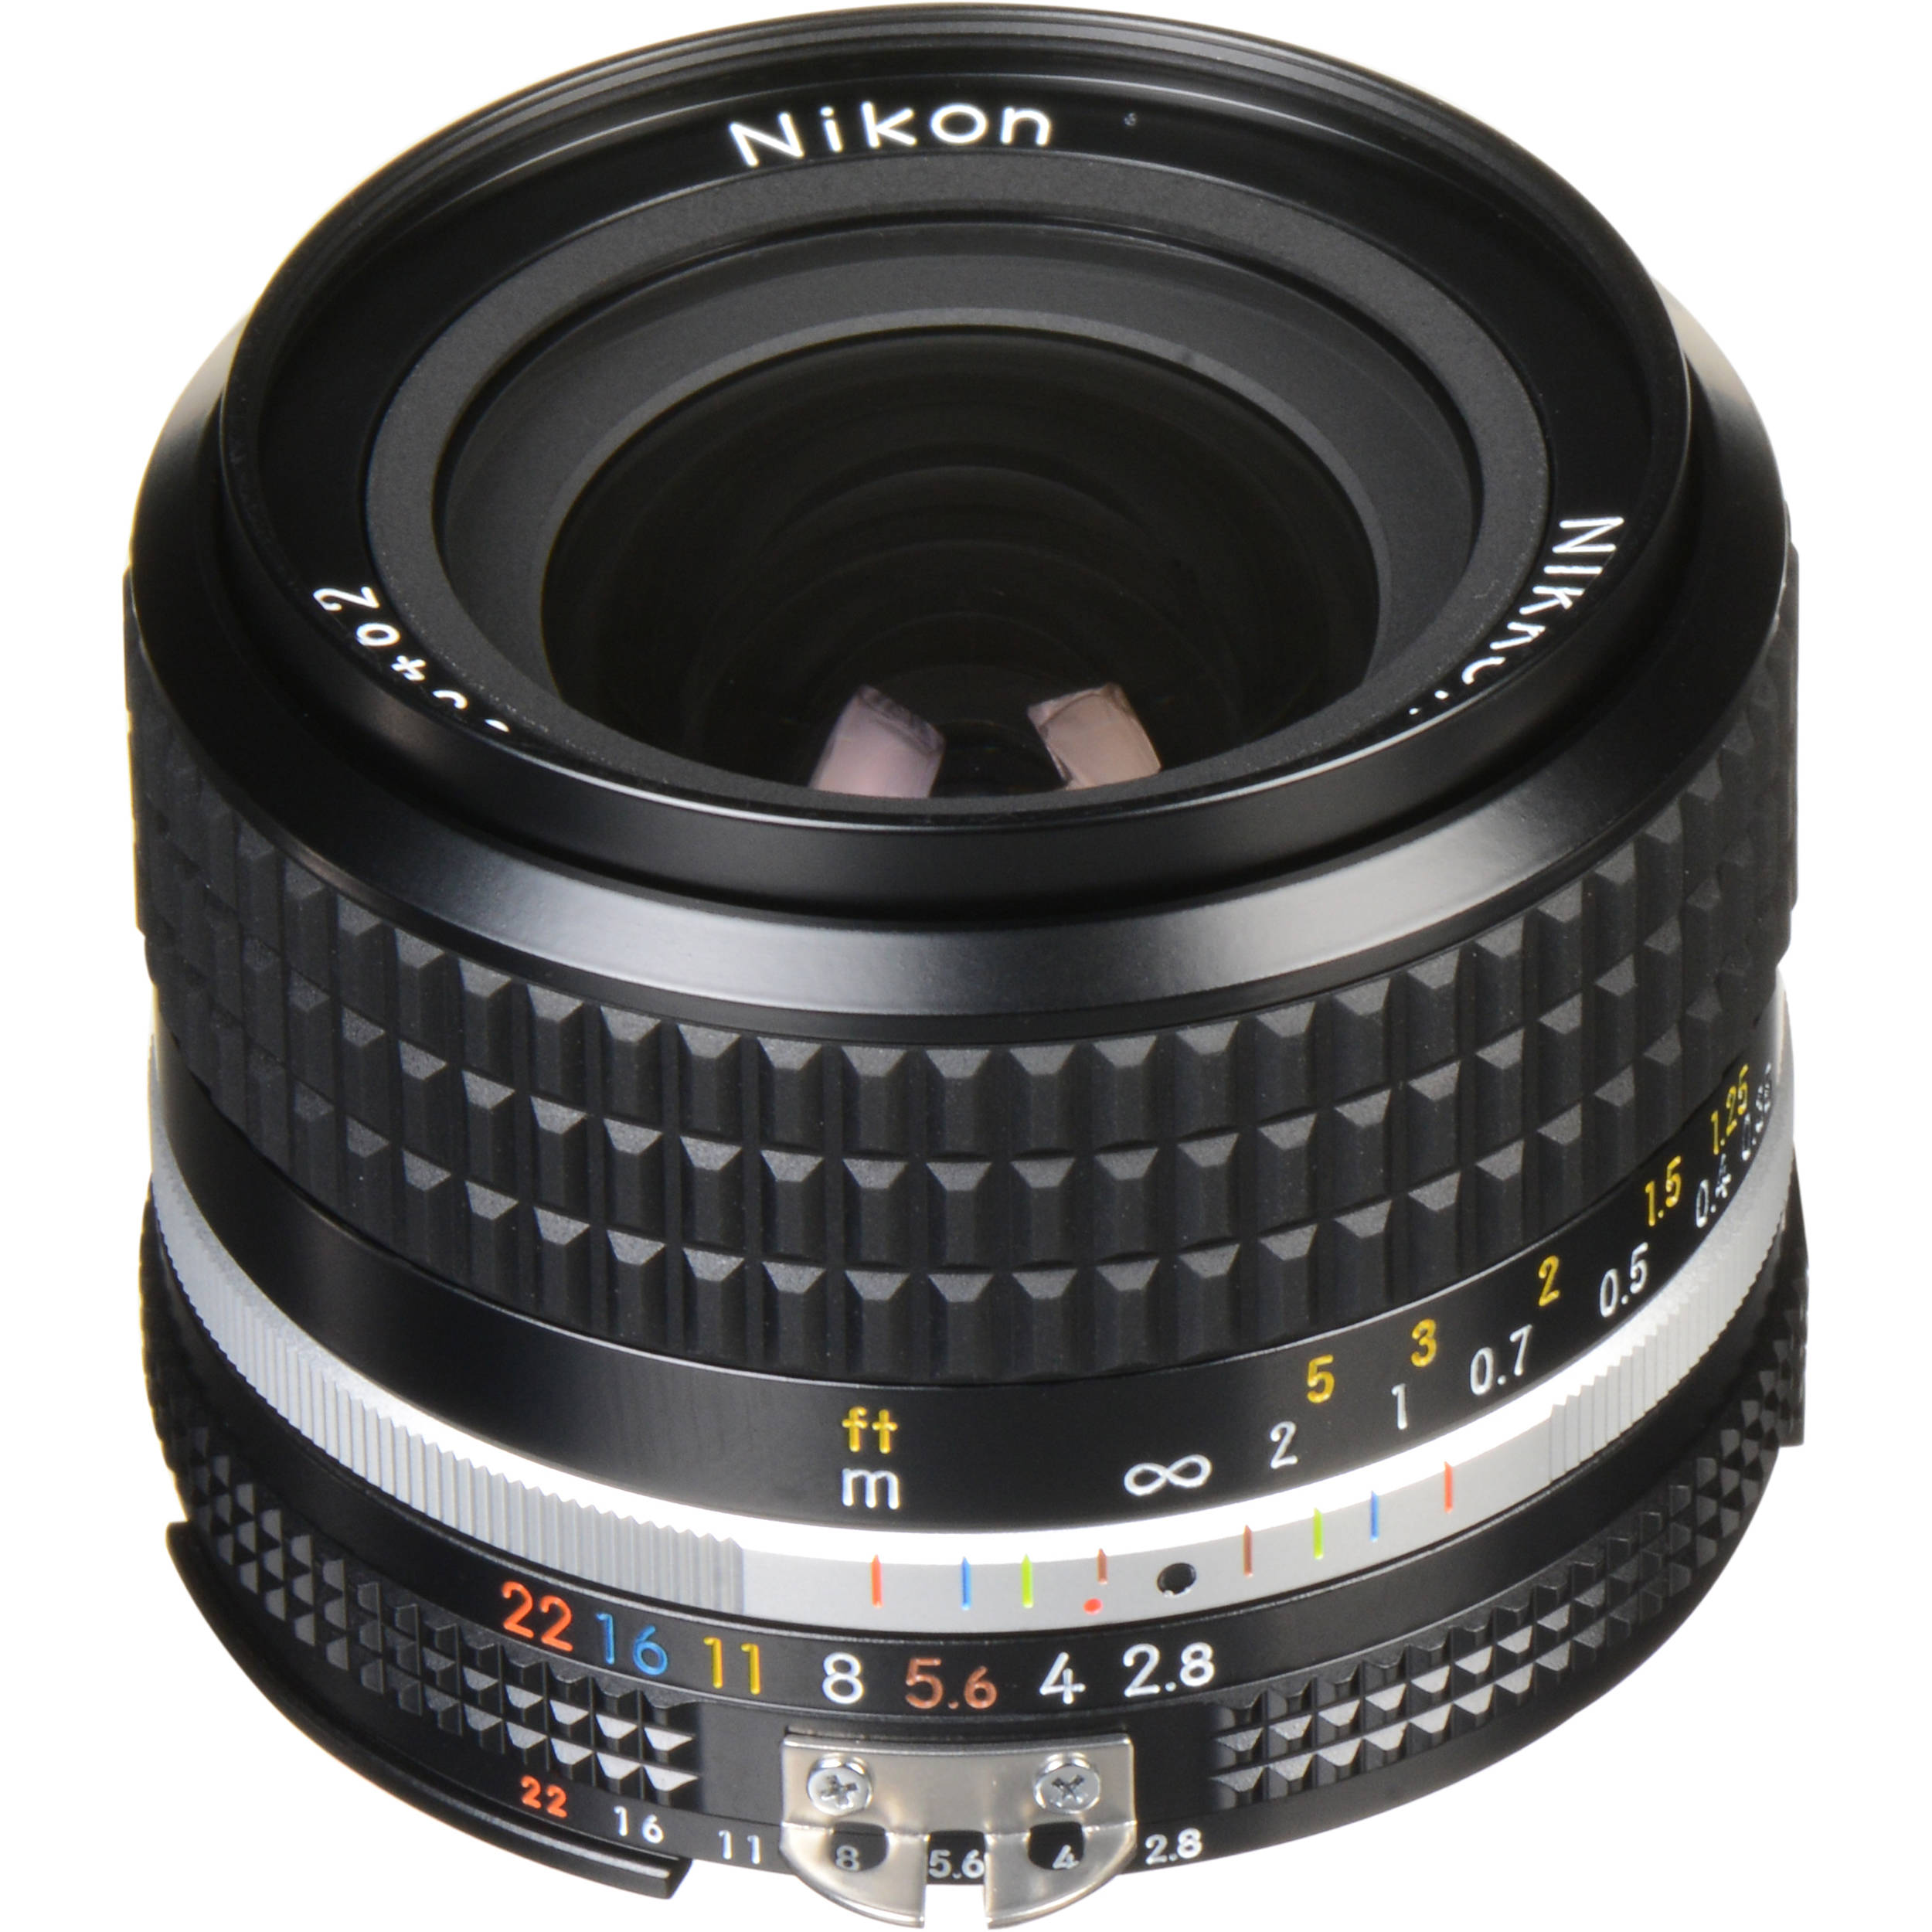 Nikon NIKKOR 24mm f/2.8 Lens 1416 B&H Photo Video